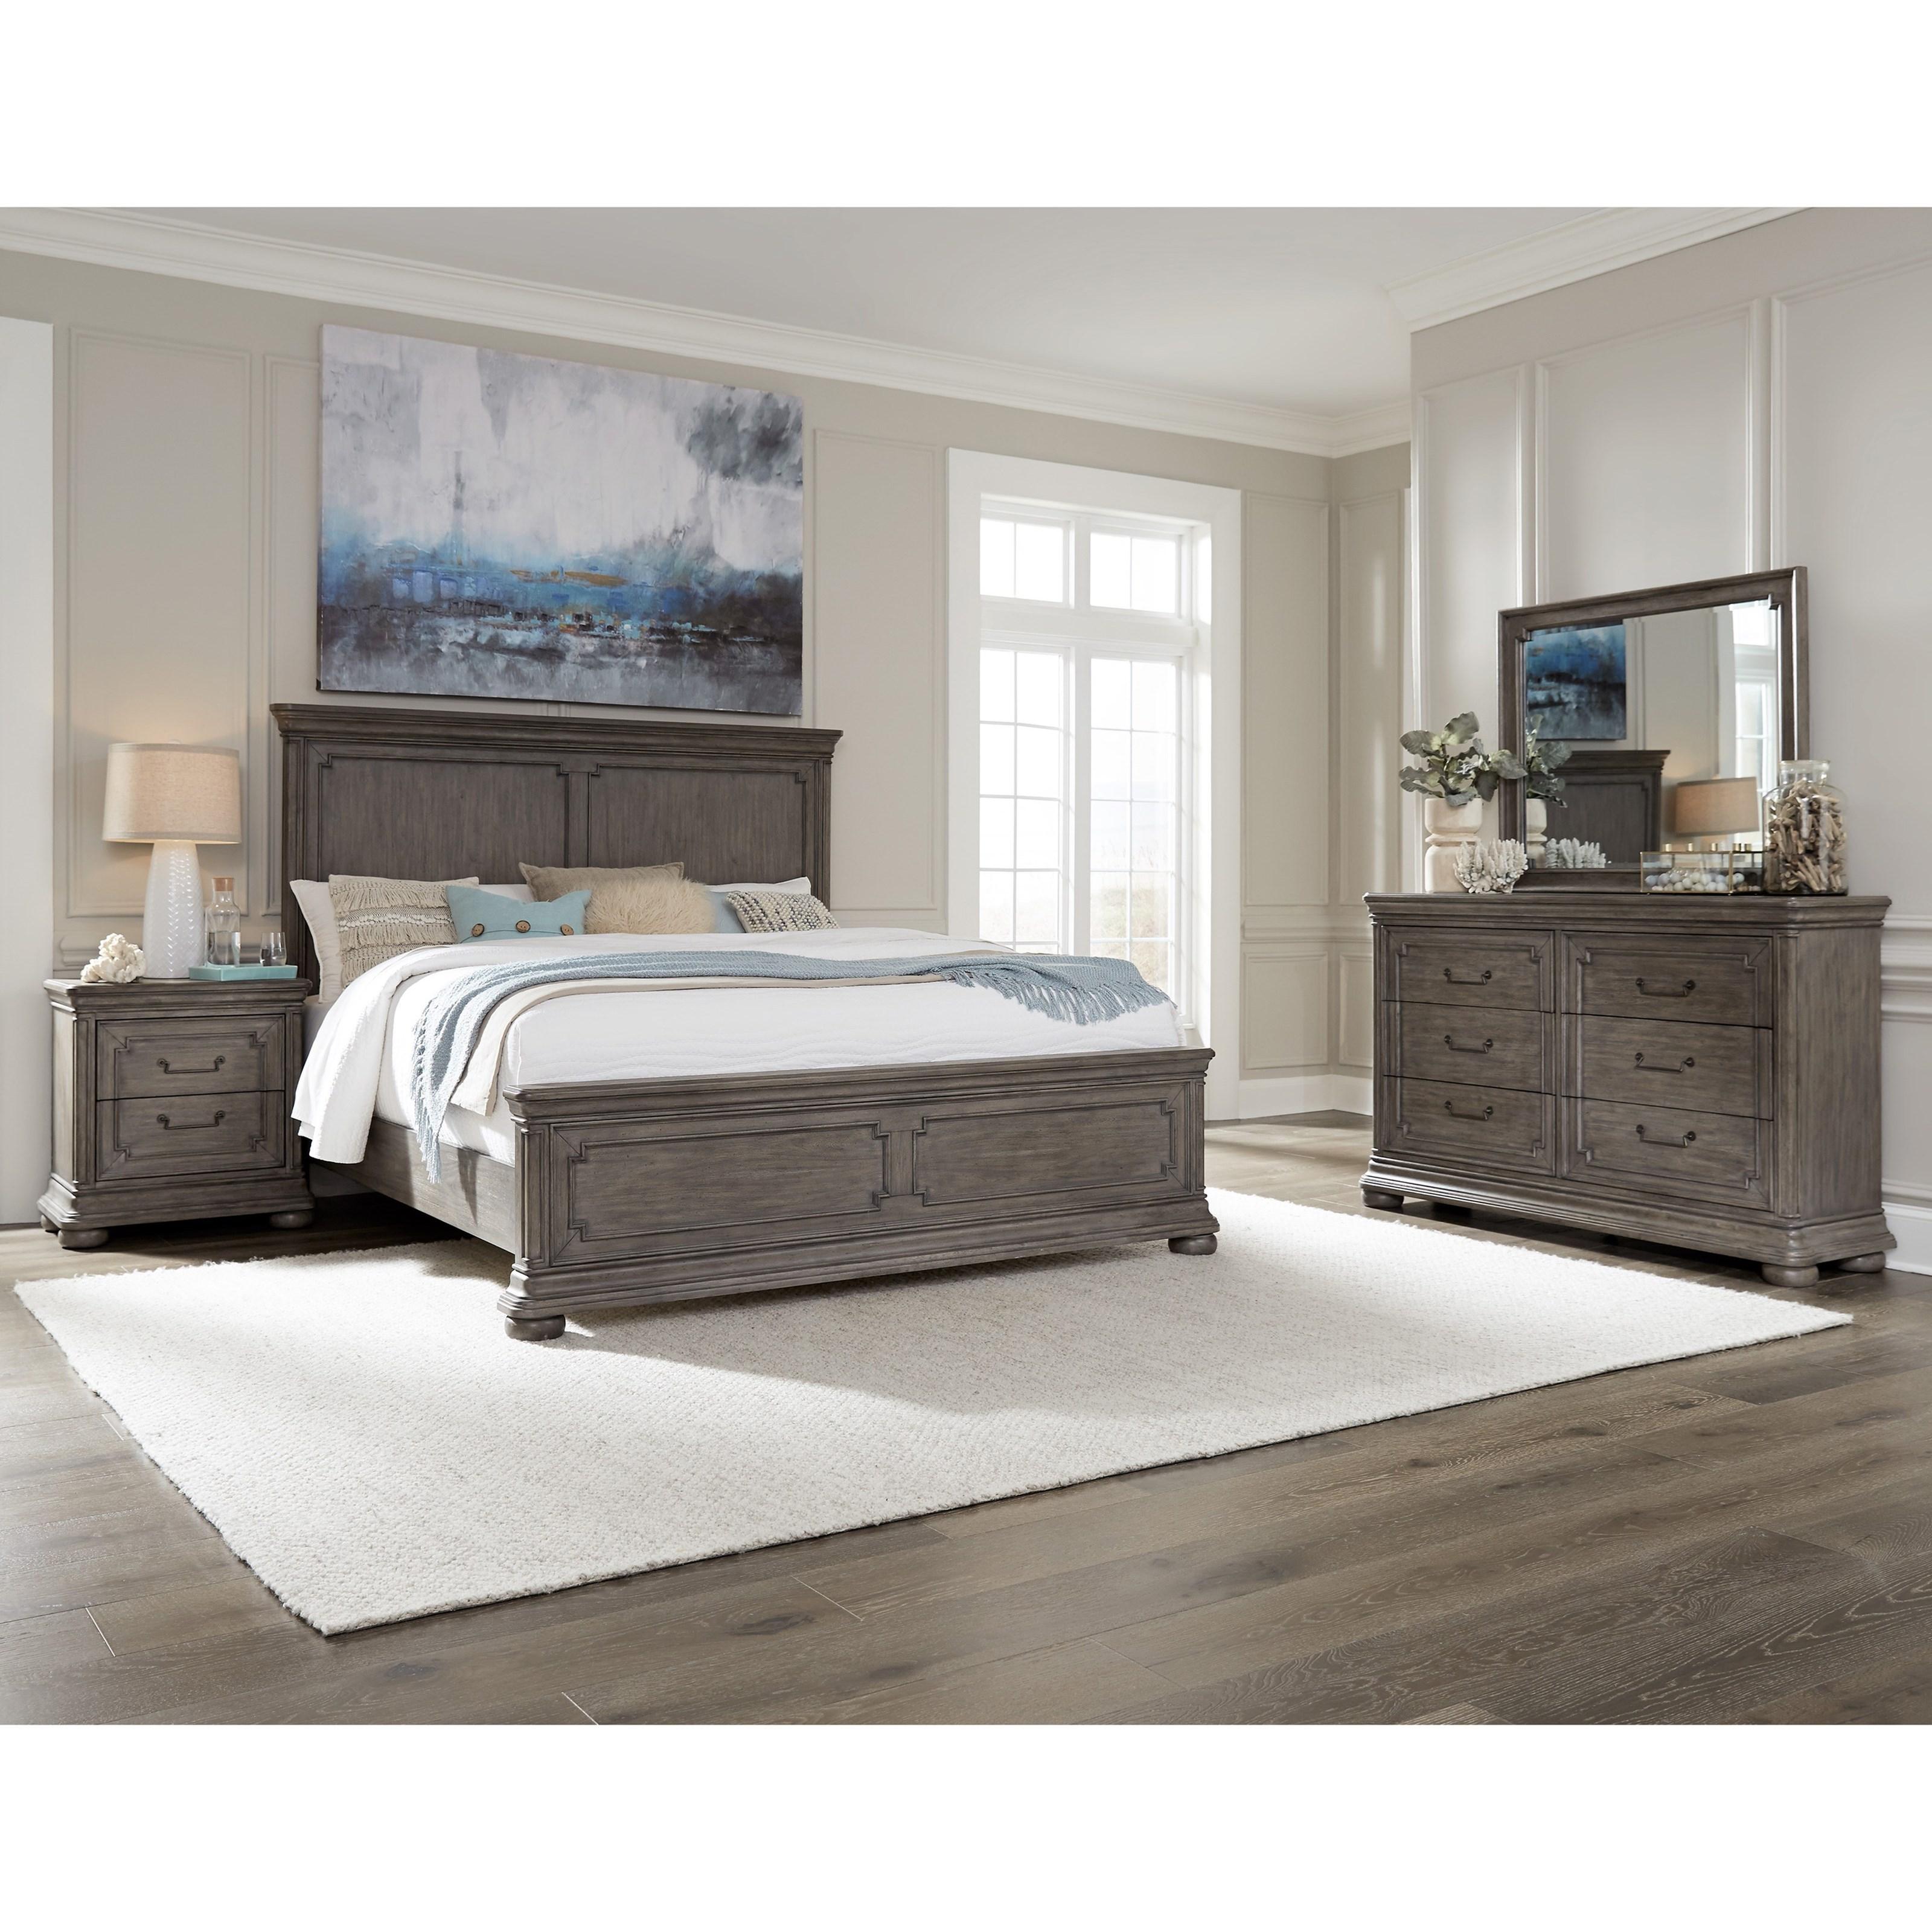 Lasalle King Bedroom Group by Samuel Lawrence at Carolina Direct